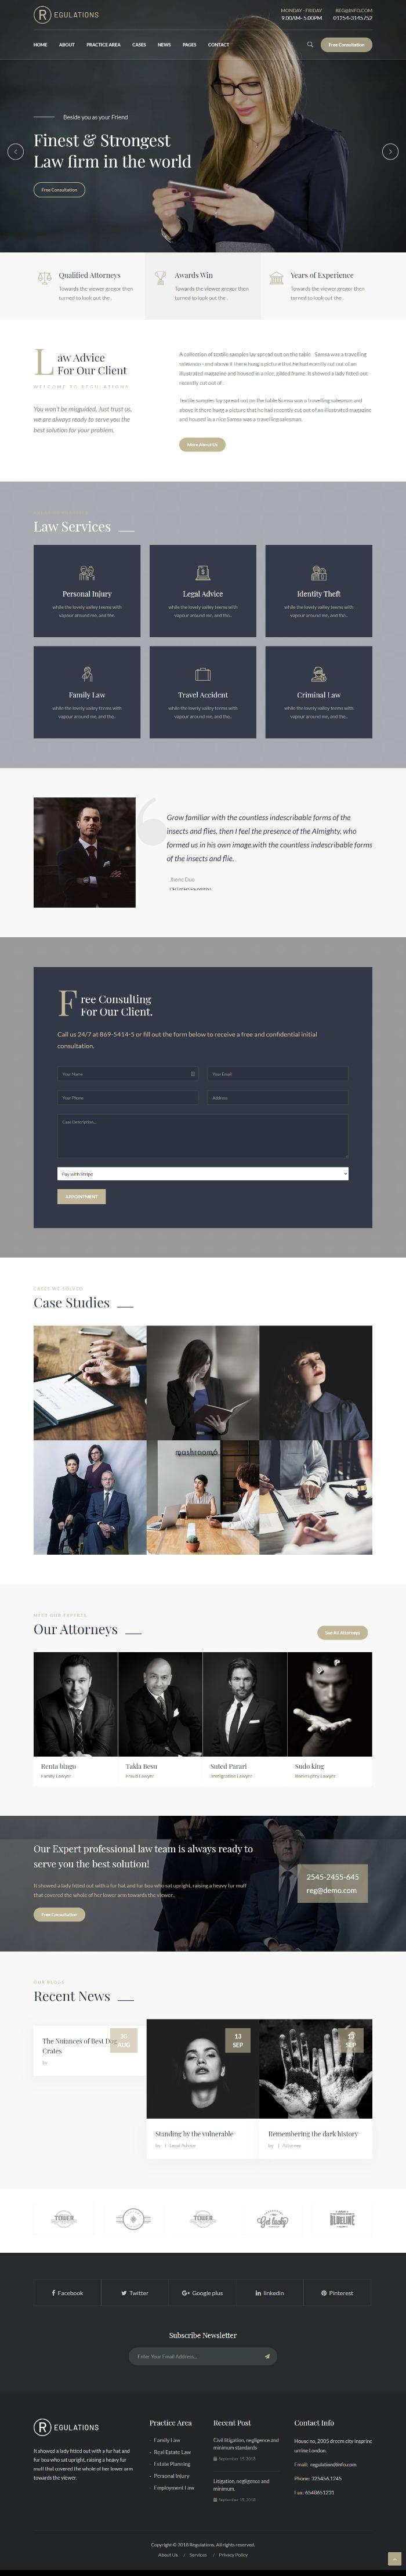 MẪU WEBSITE CÔNG TY LUẬT - REGULATIONS HOME 1